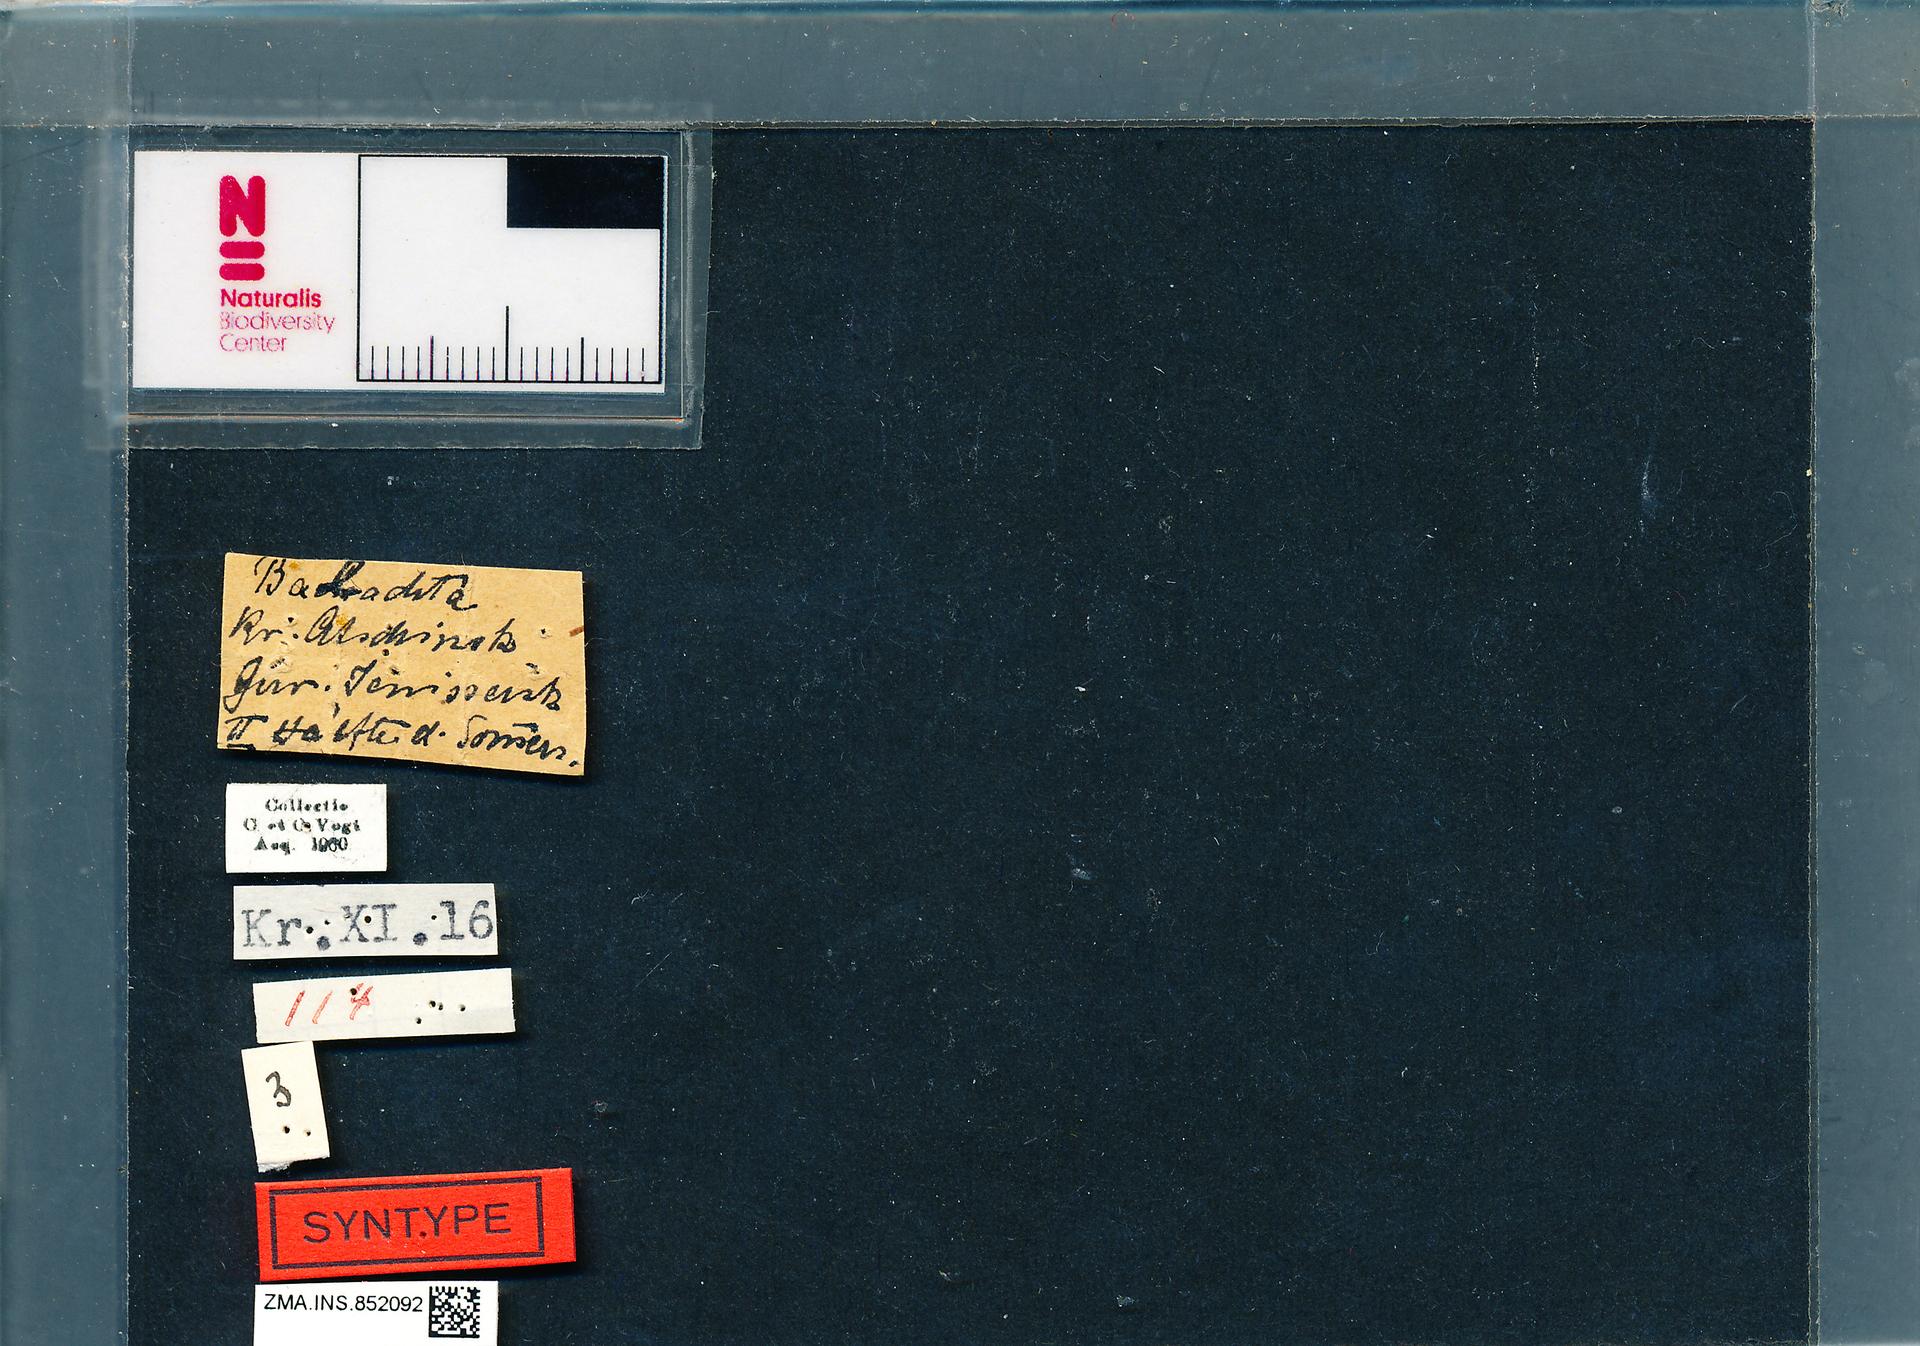 ZMA.INS.852092 | Bombus (Psithyrus) rupestris orientalis Reinig, 1936